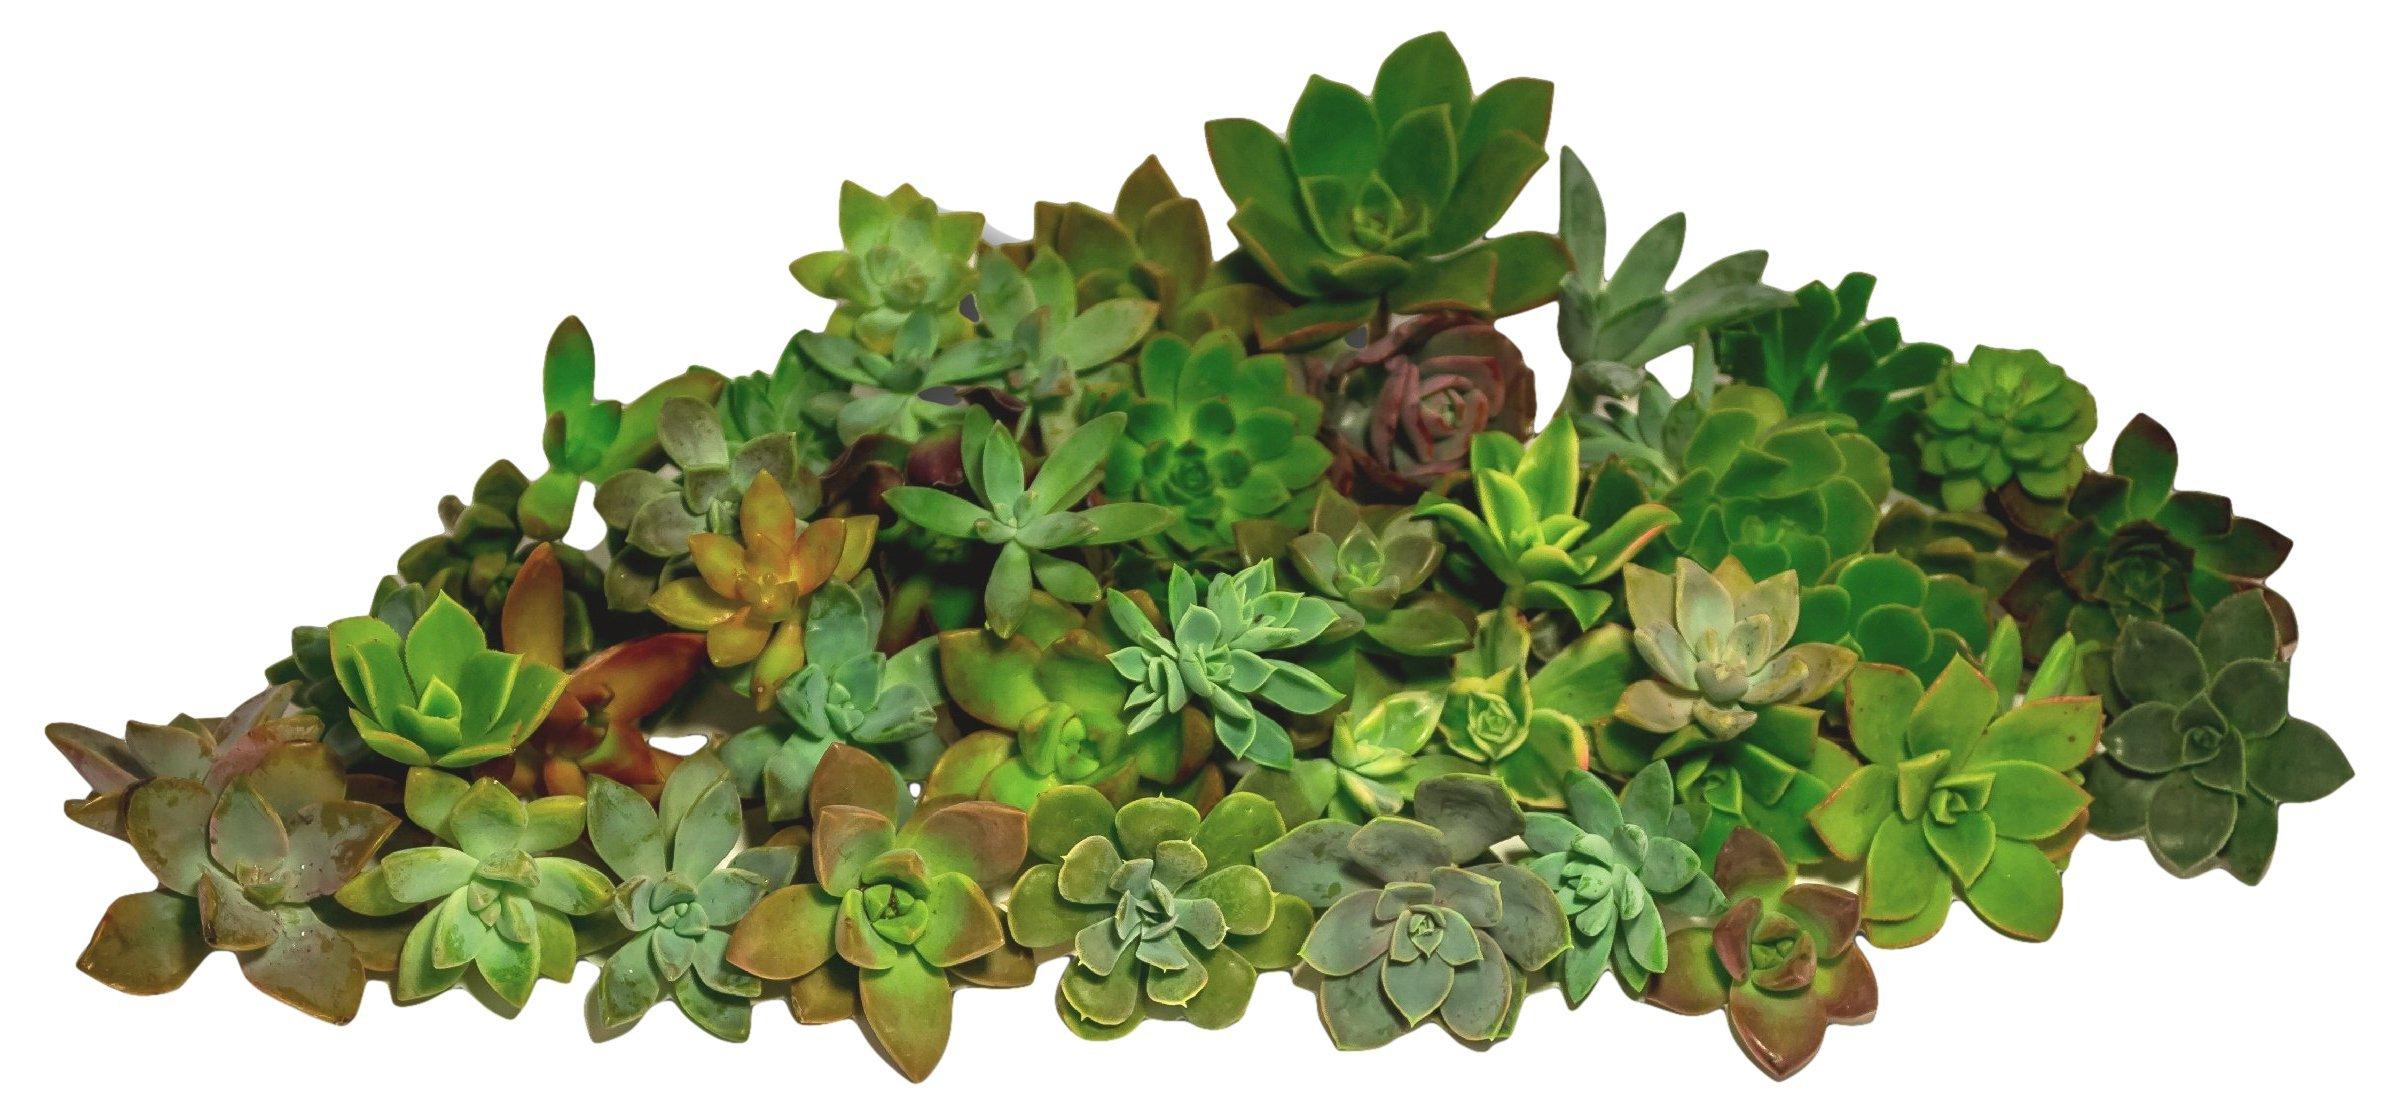 Fat Plants San Diego Gorgeous All Rosette Succulent Cuttings (50)